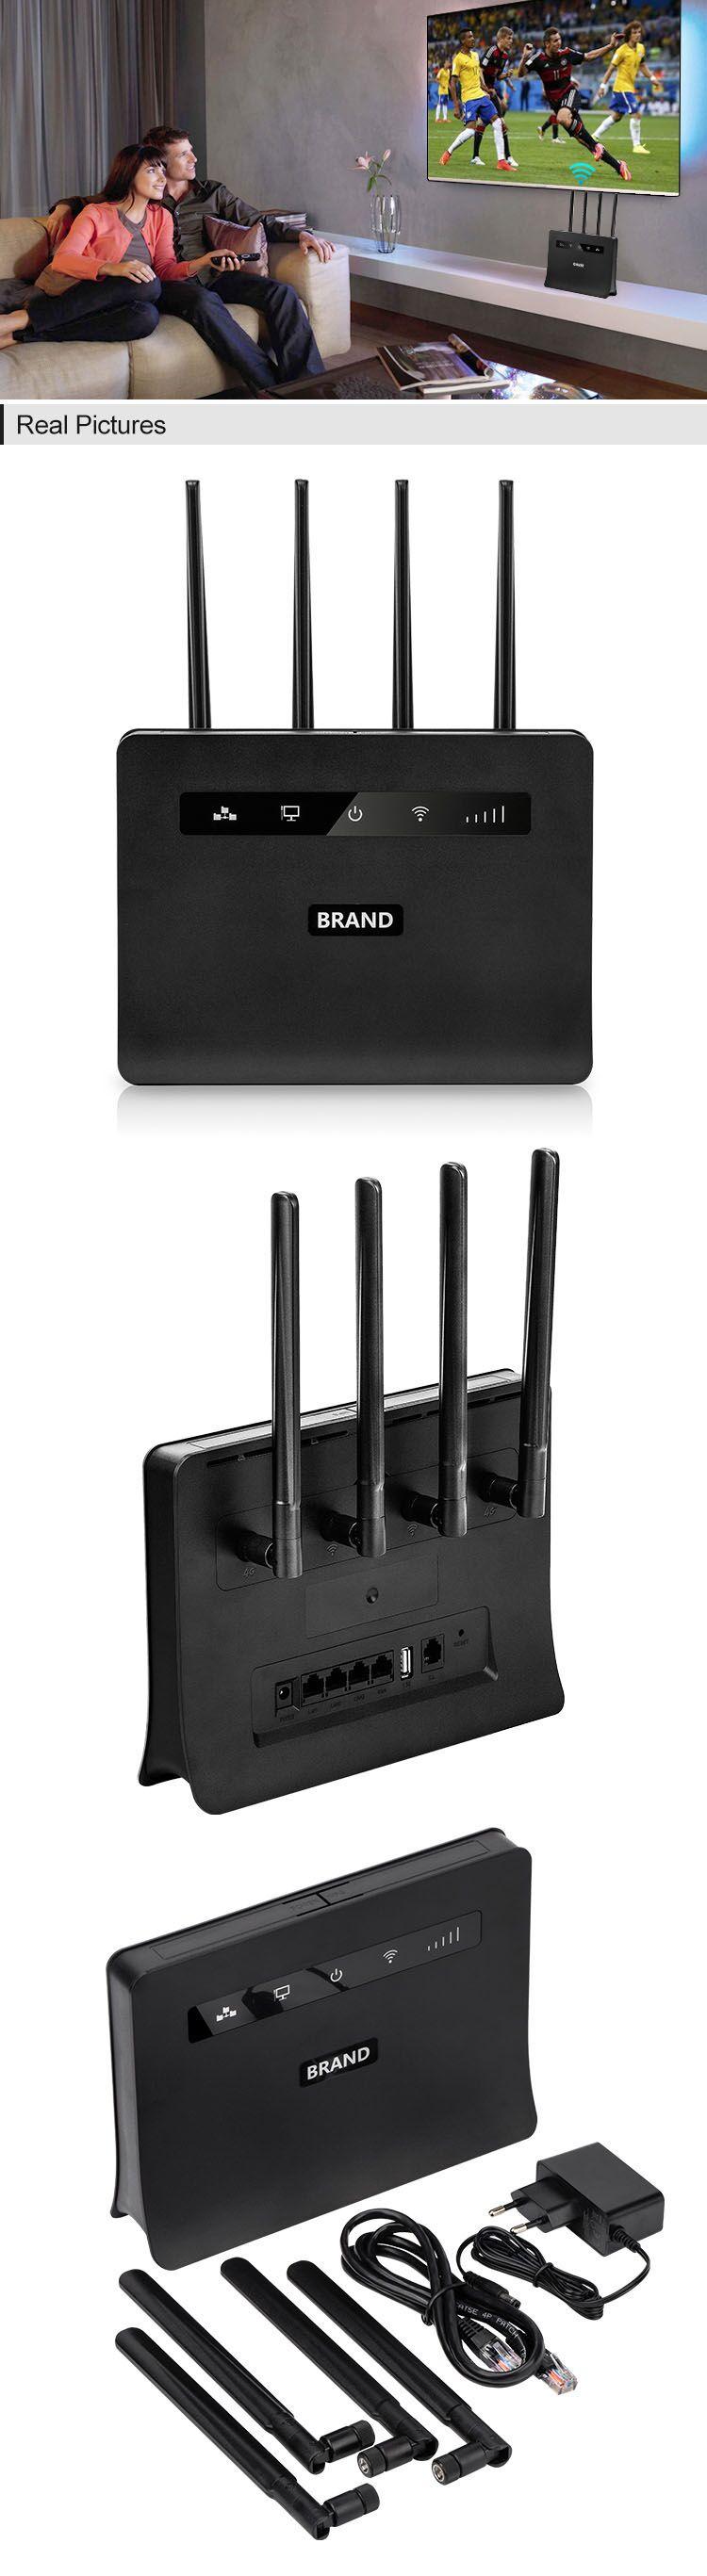 sim card router with rj45 wan/lan port